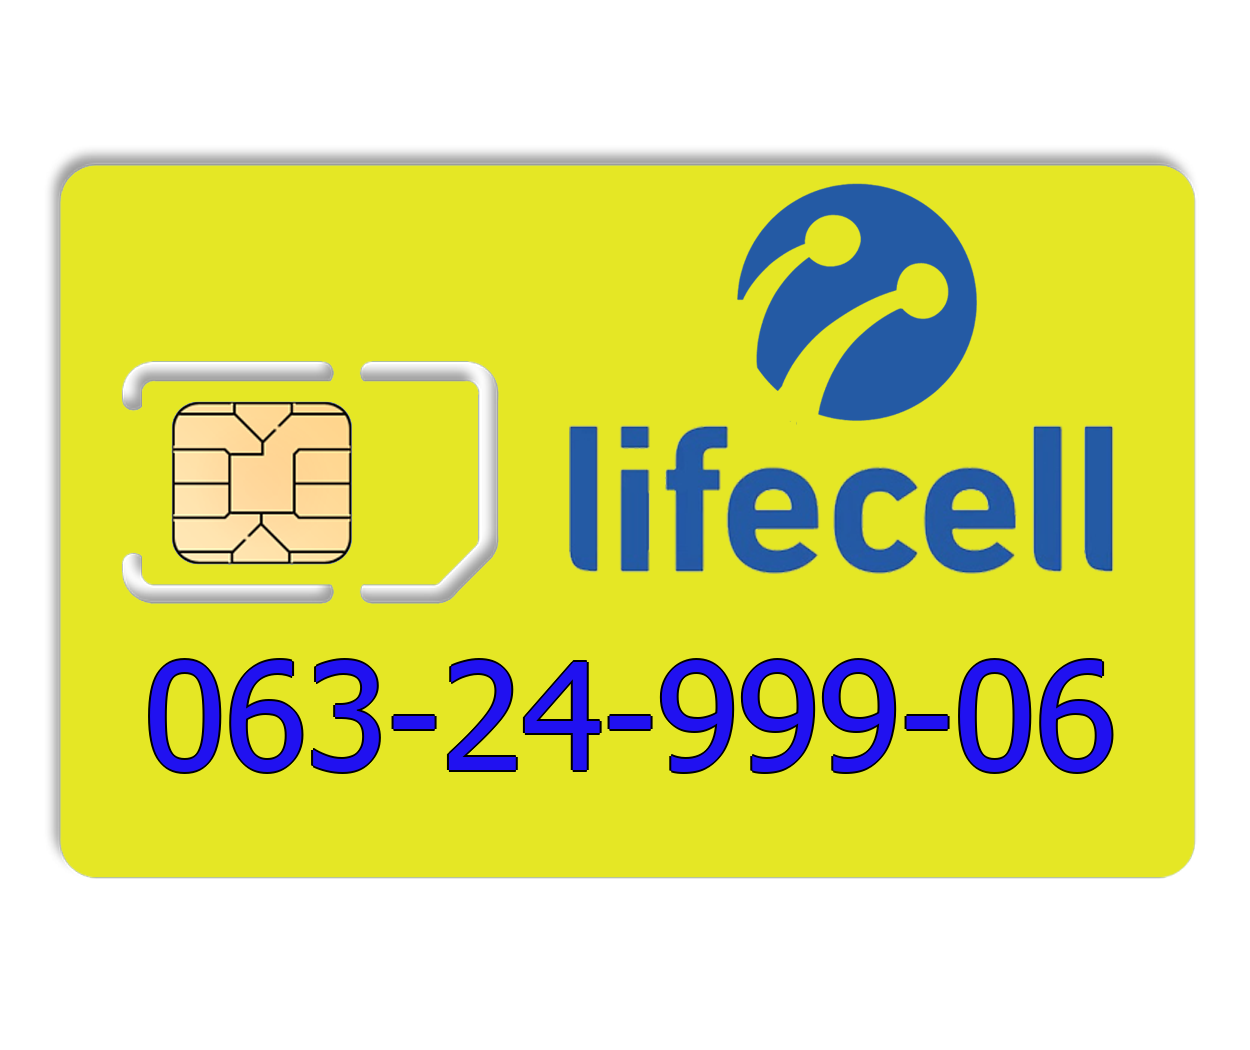 Красивий номер lifecell 063-24-999-06